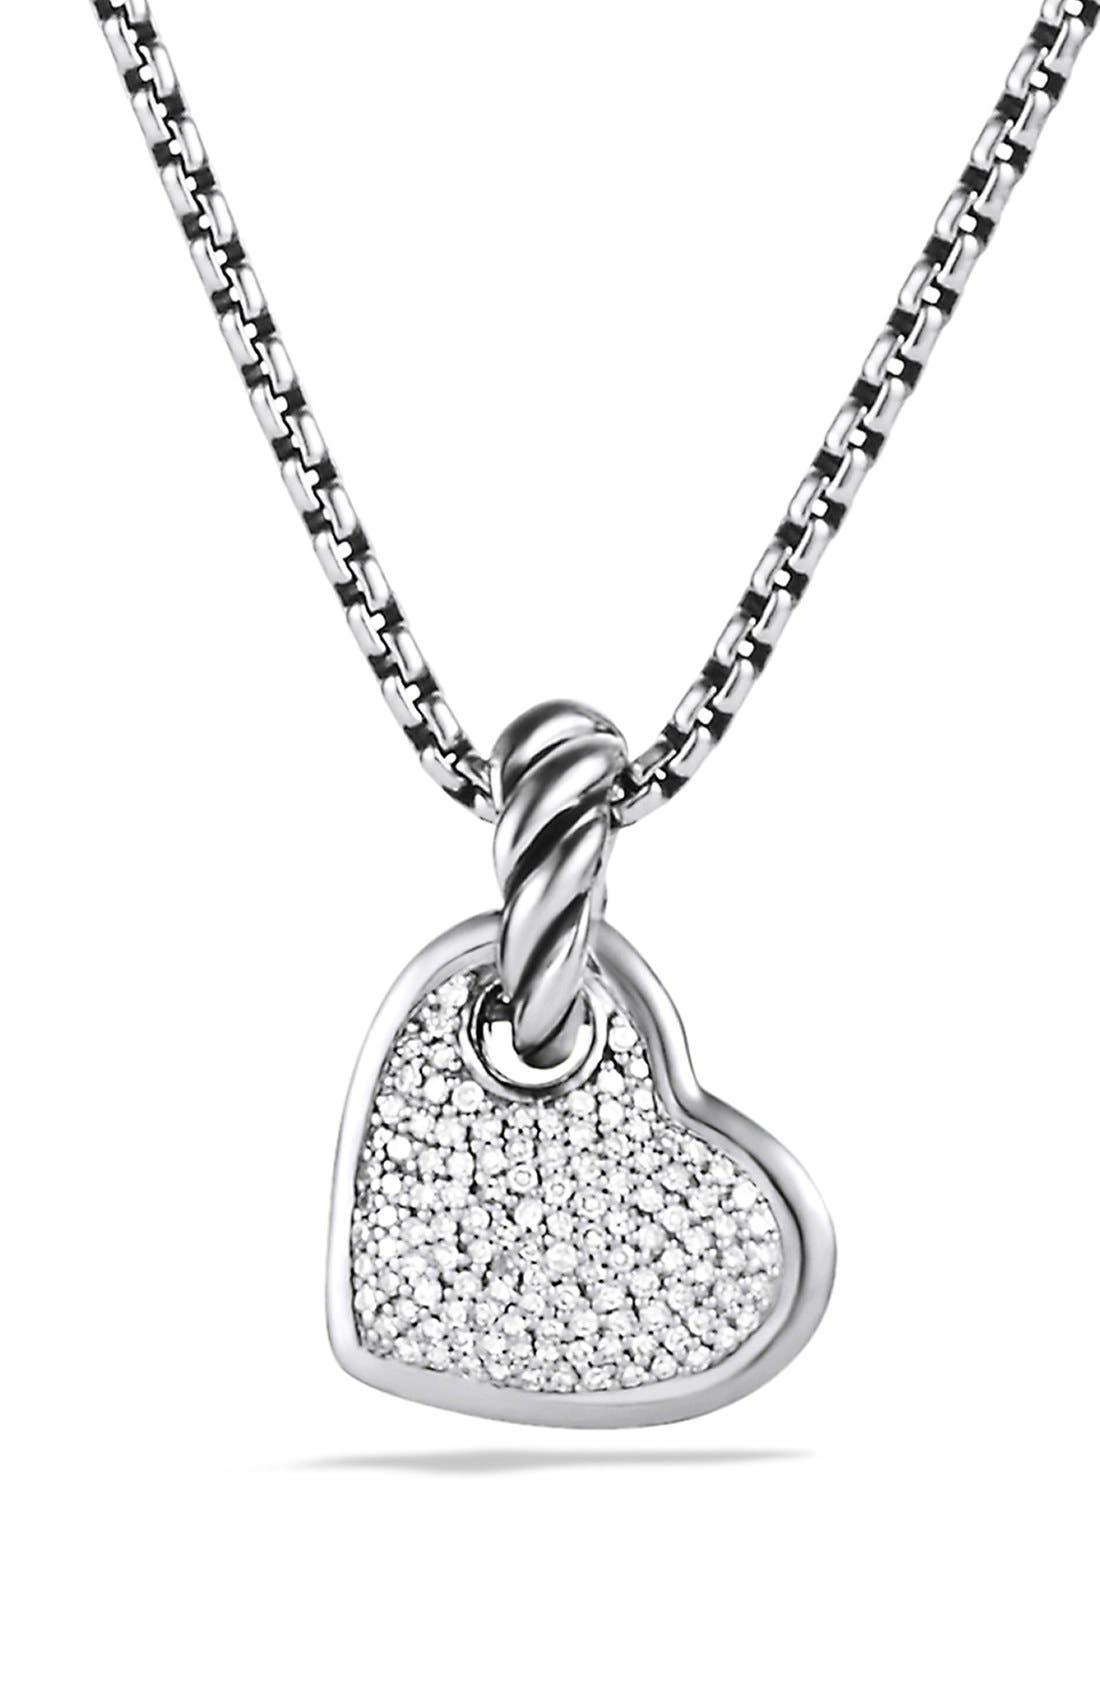 Main Image - David Yurman 'Cable Heart' Pendant with Diamonds